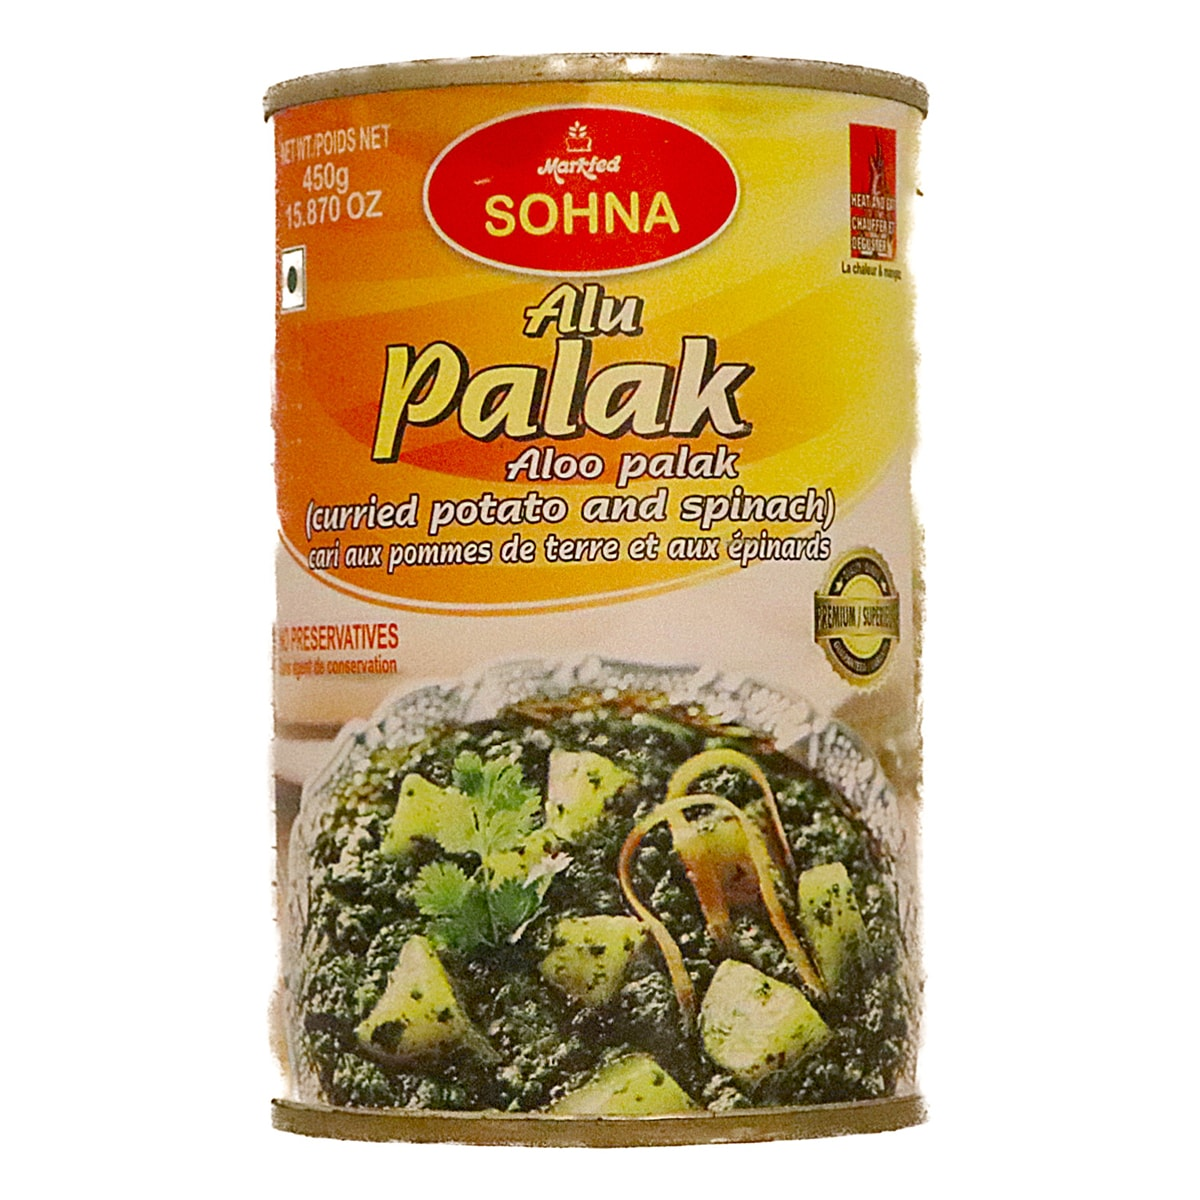 Buy Markfed Sohna Alu Palak (Spinaci Con Patate) - 450 gm